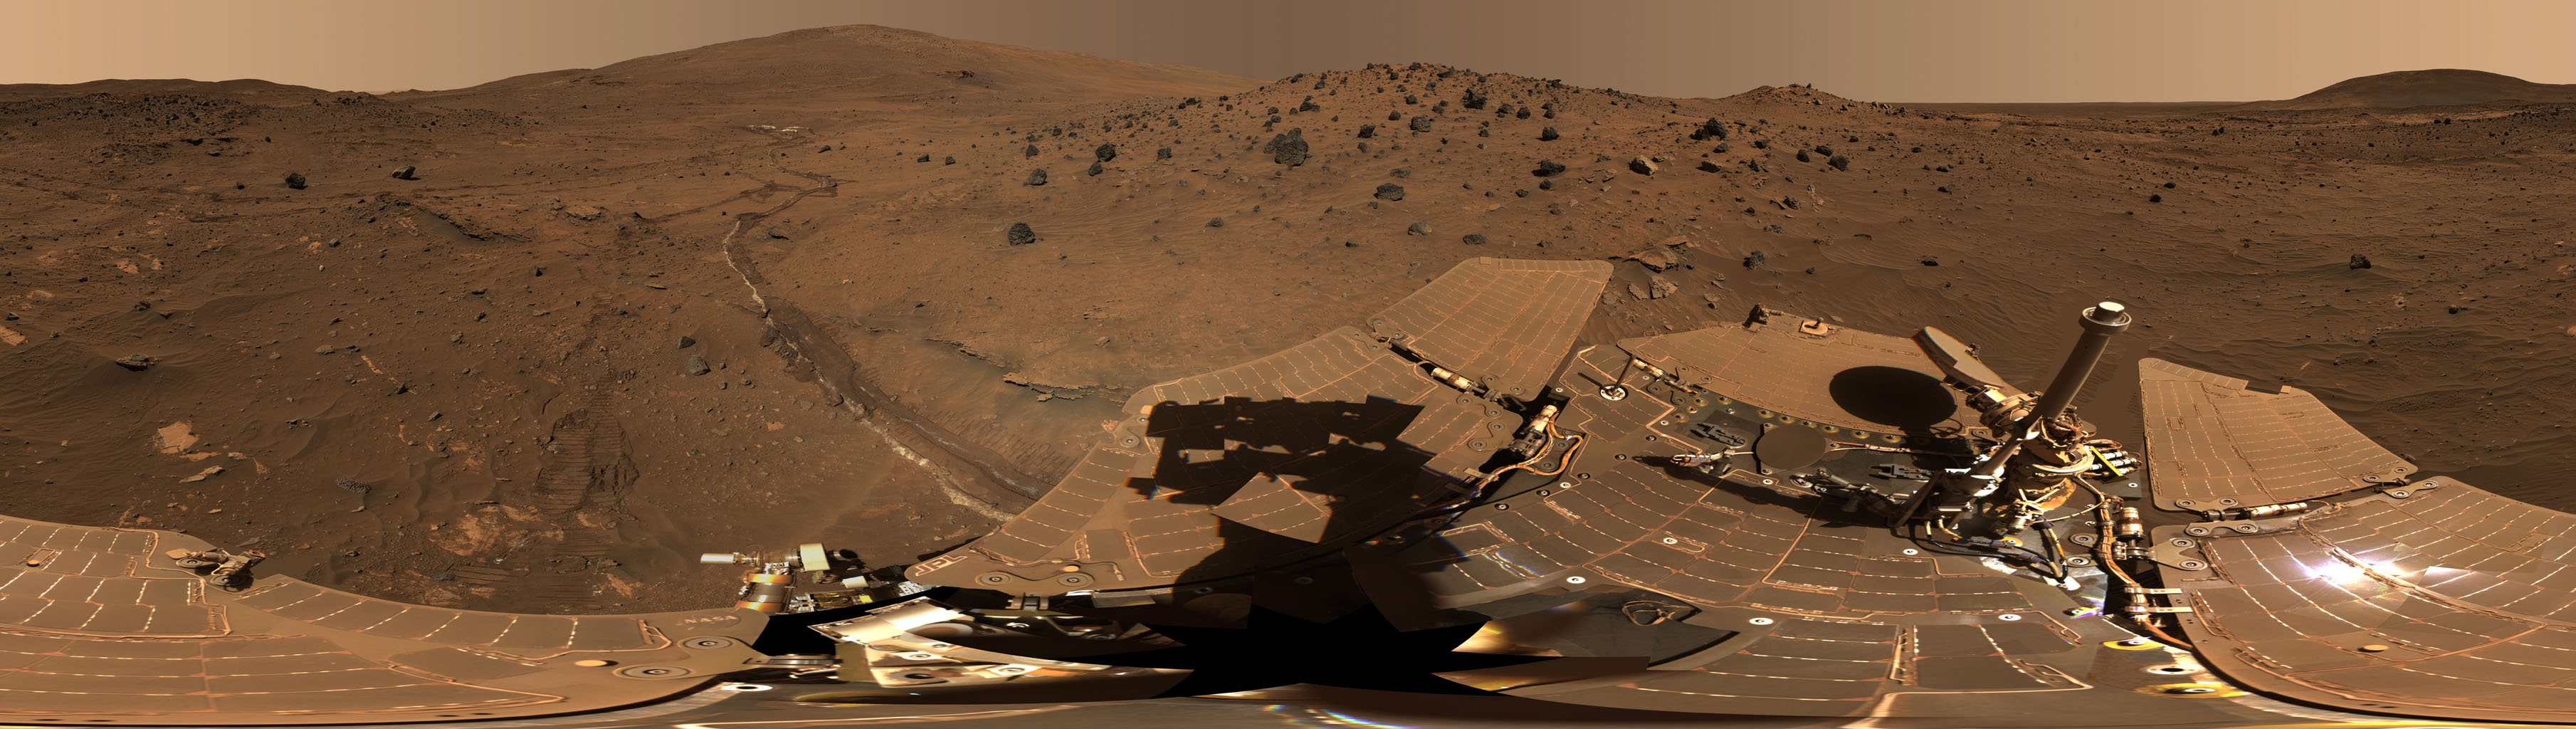 disadvantages of mars exploration rover - photo #25